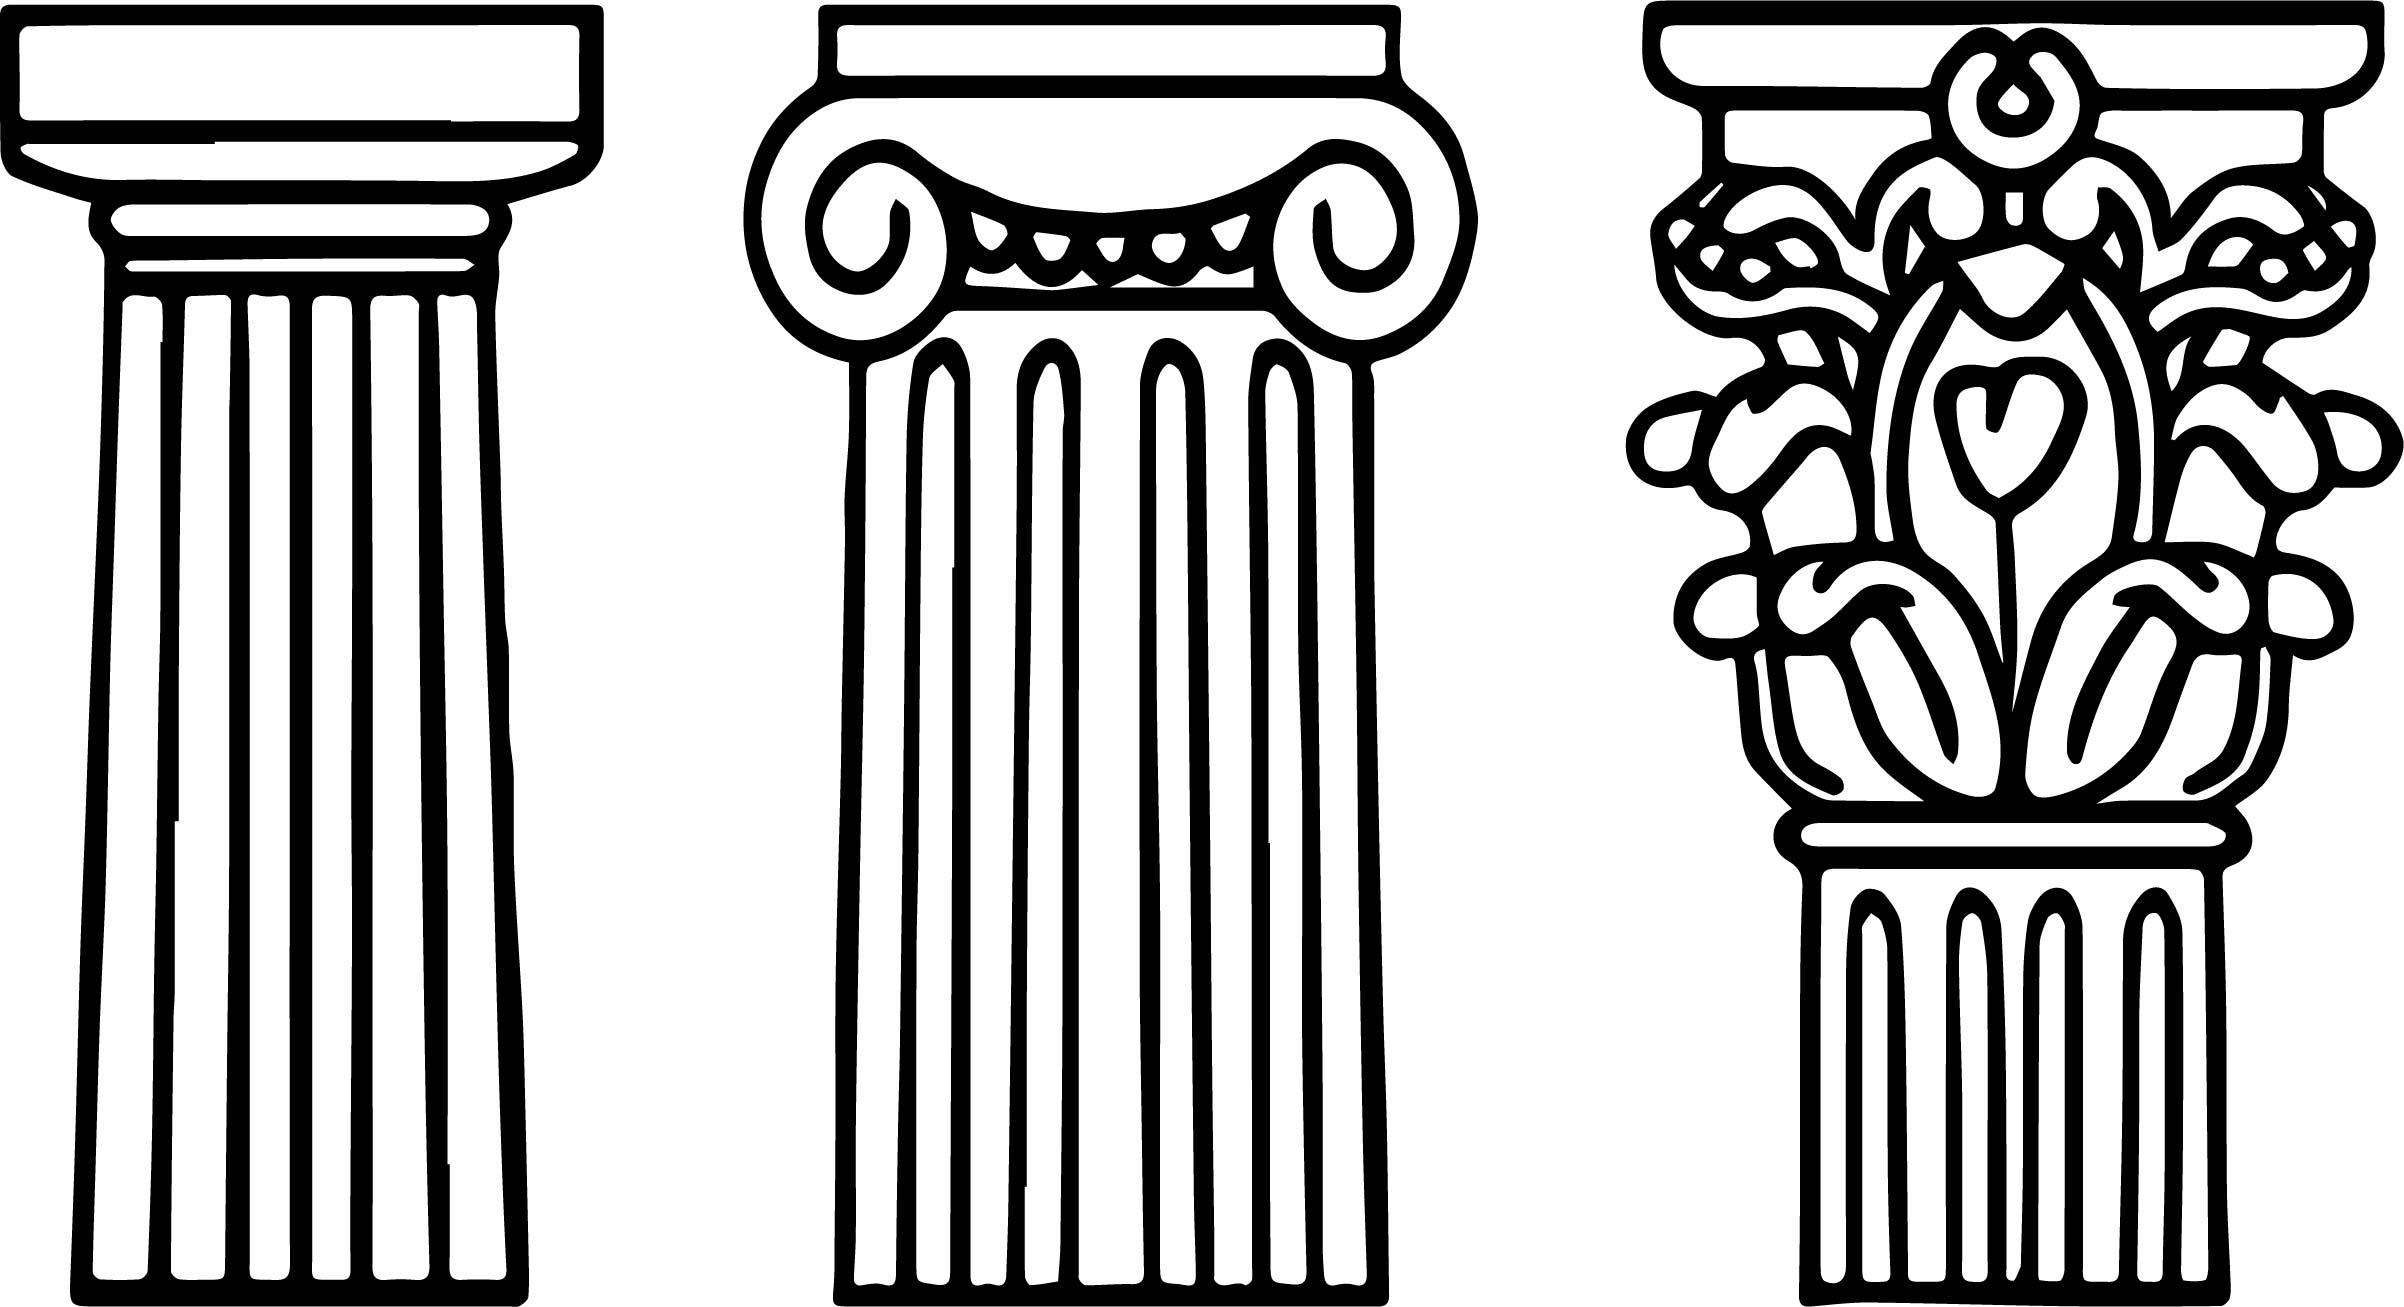 Architecture Columns Coloring Page